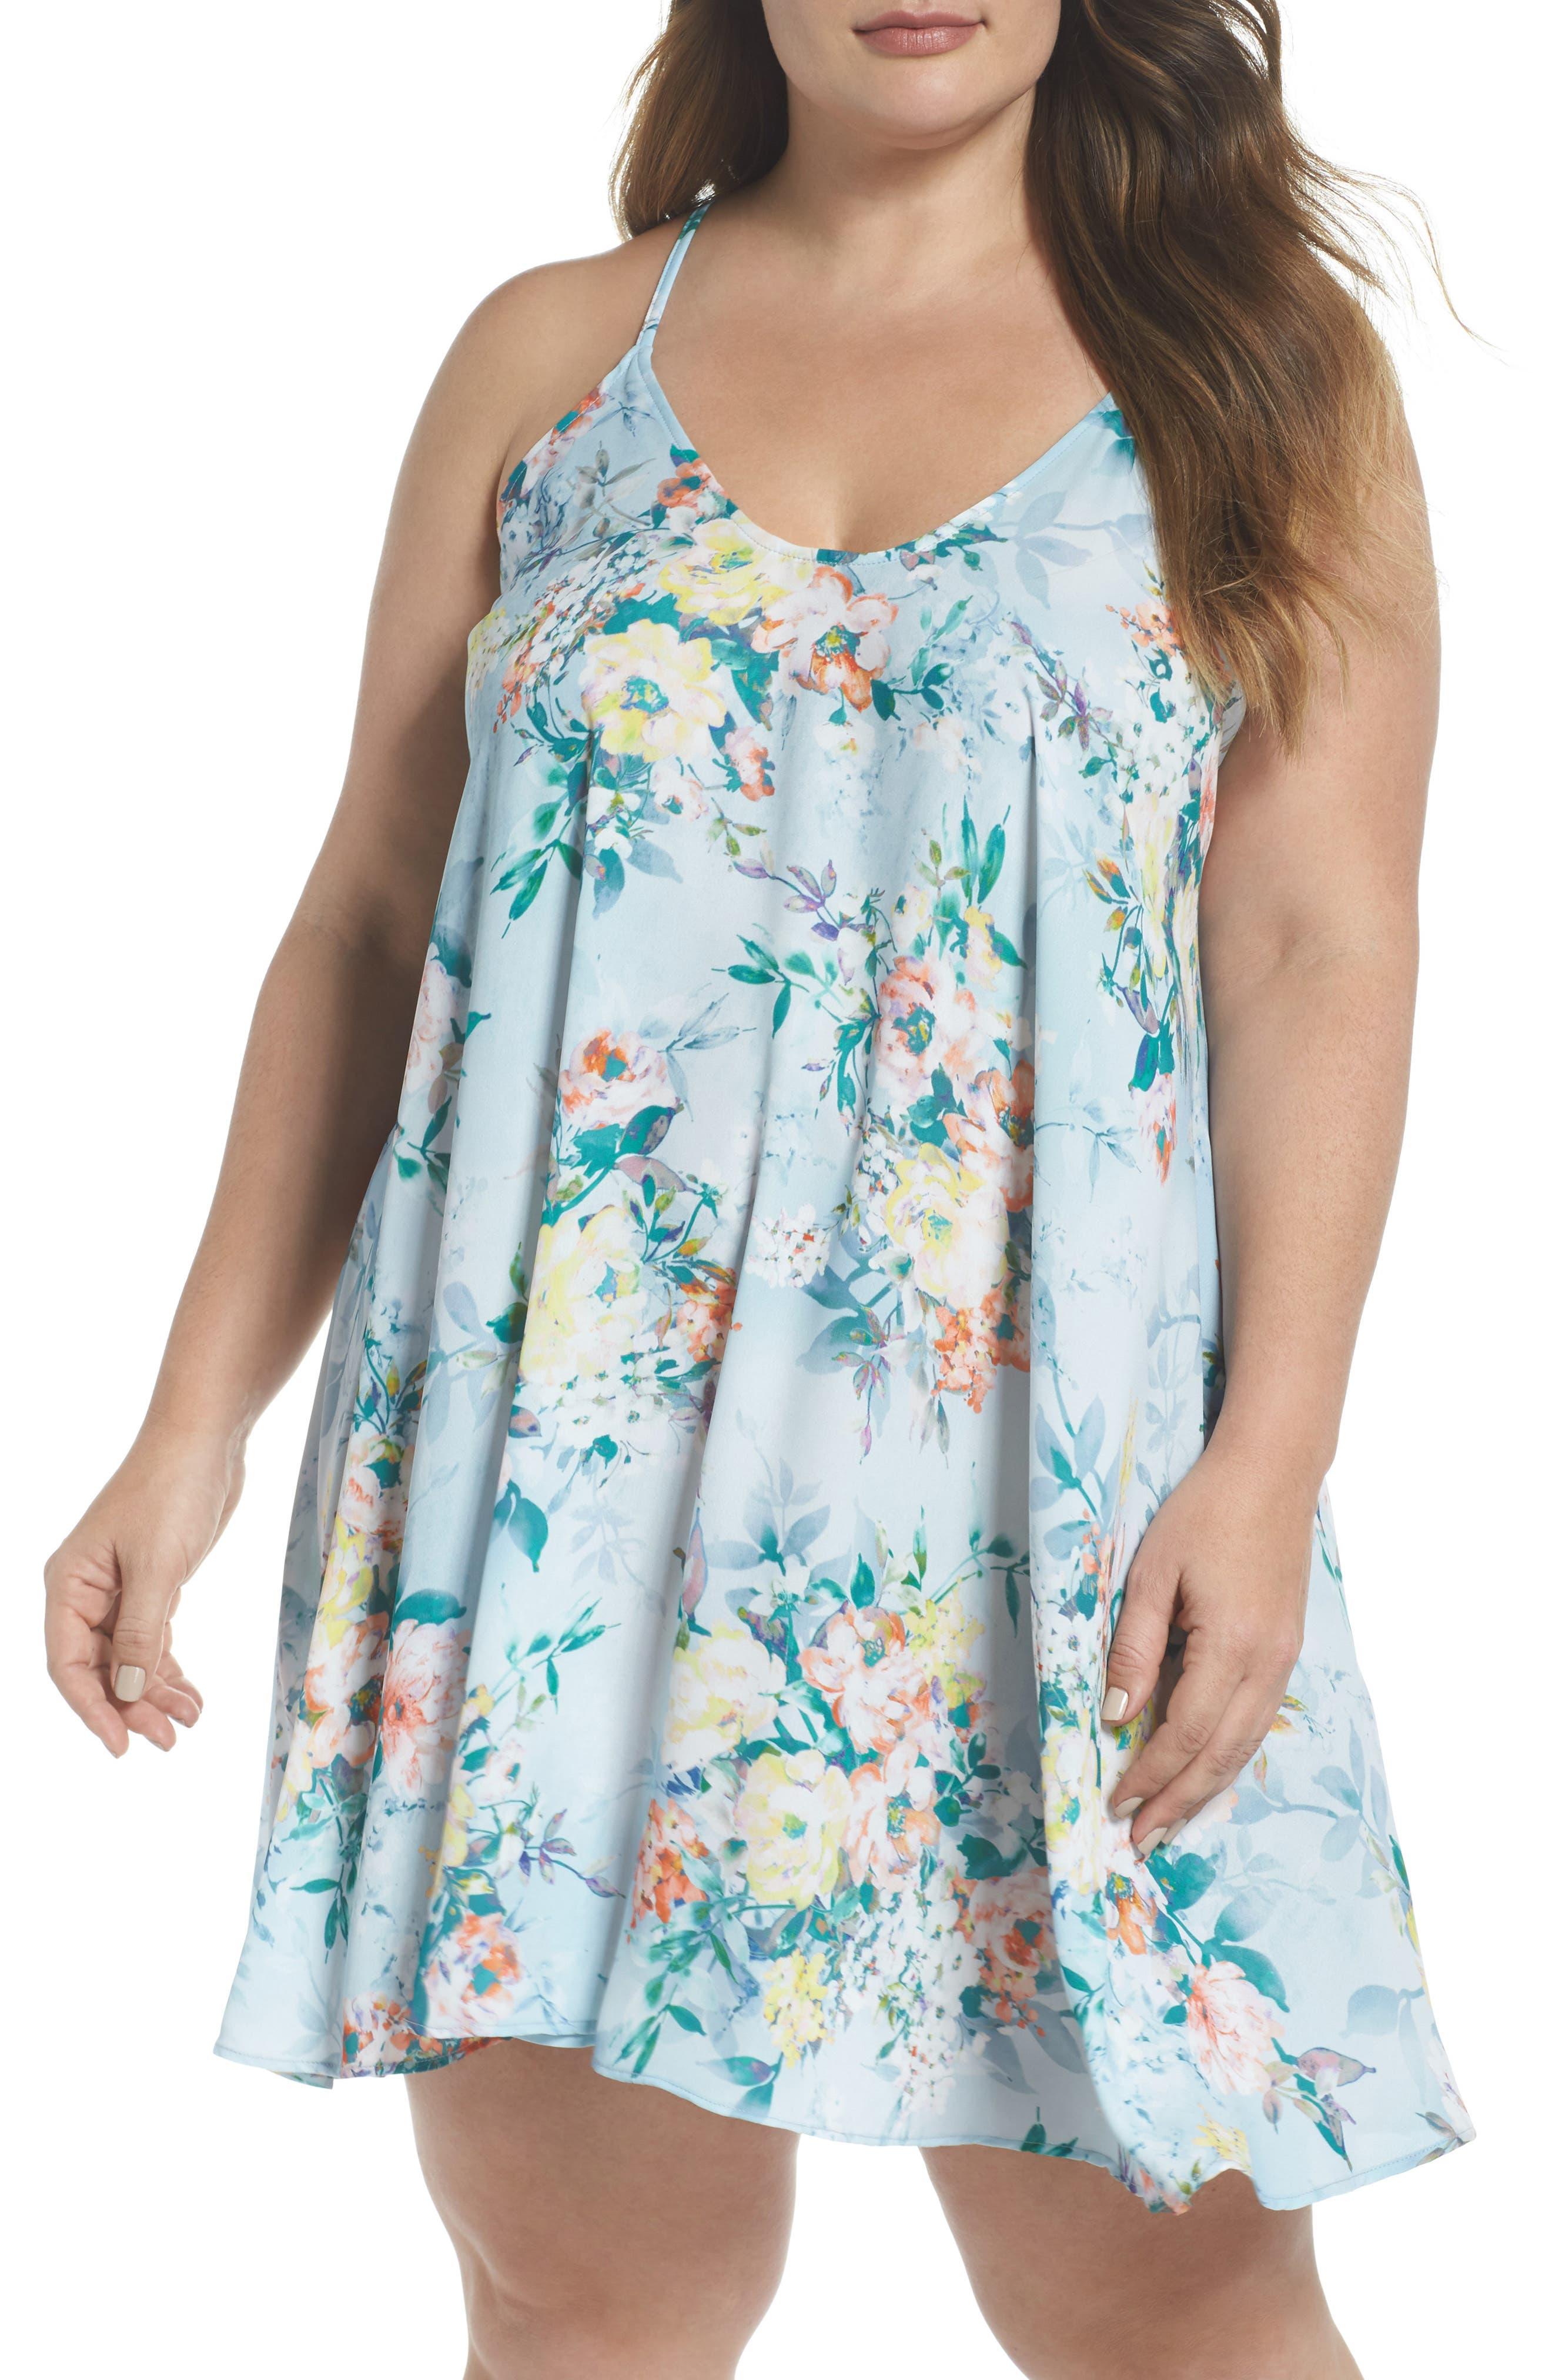 Femme Flora Cover-Up Dress,                         Main,                         color, Blue Multi